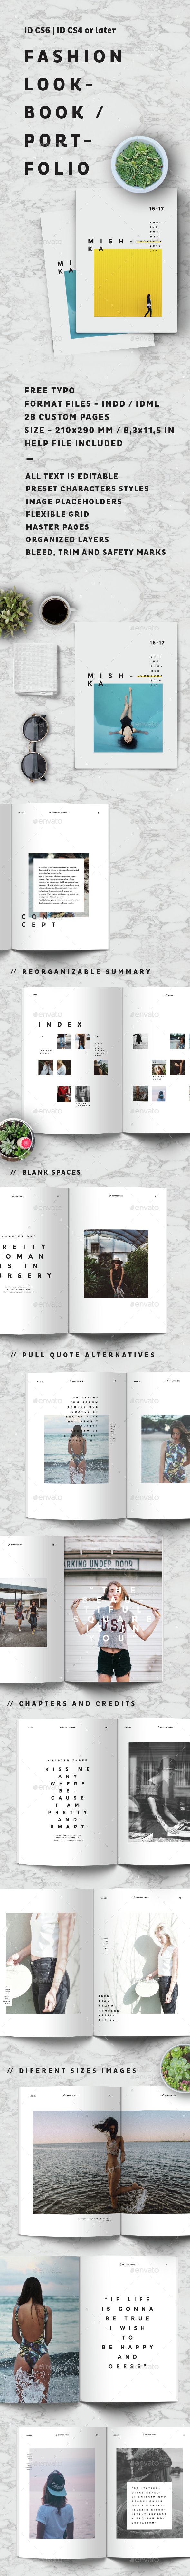 Fashion Lookbook / Portfolio - Brochures Print Templates